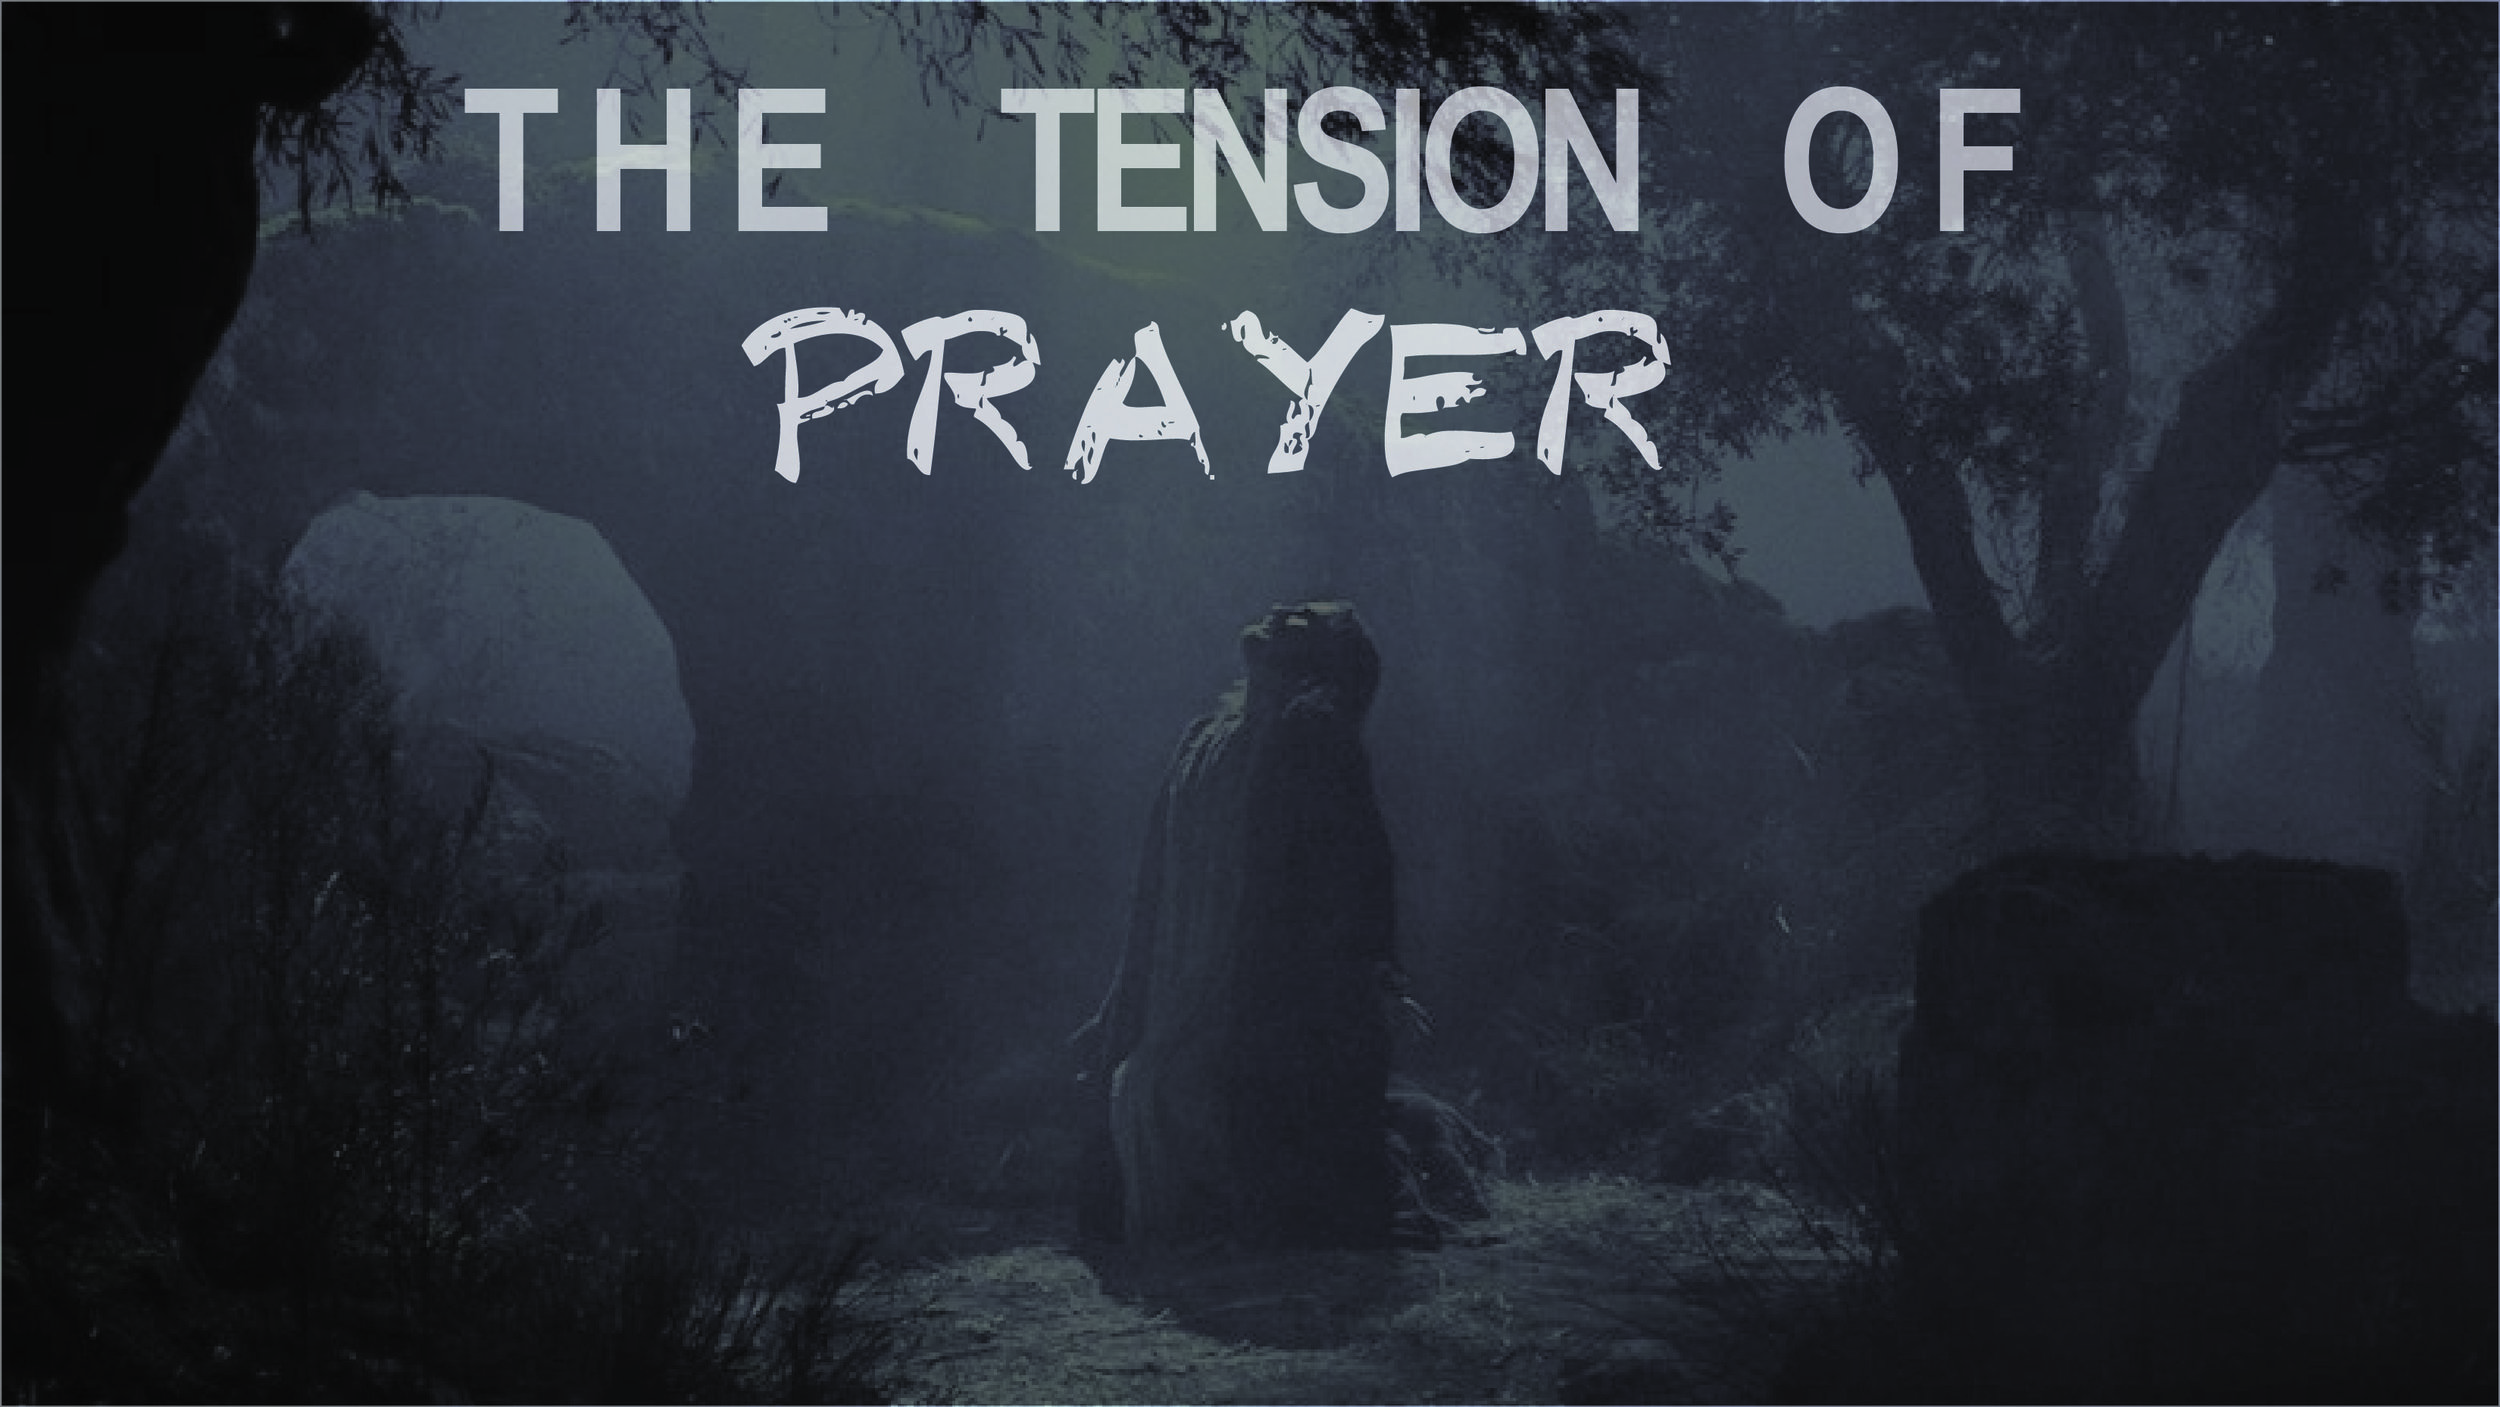 tensionofprayer-01.jpg